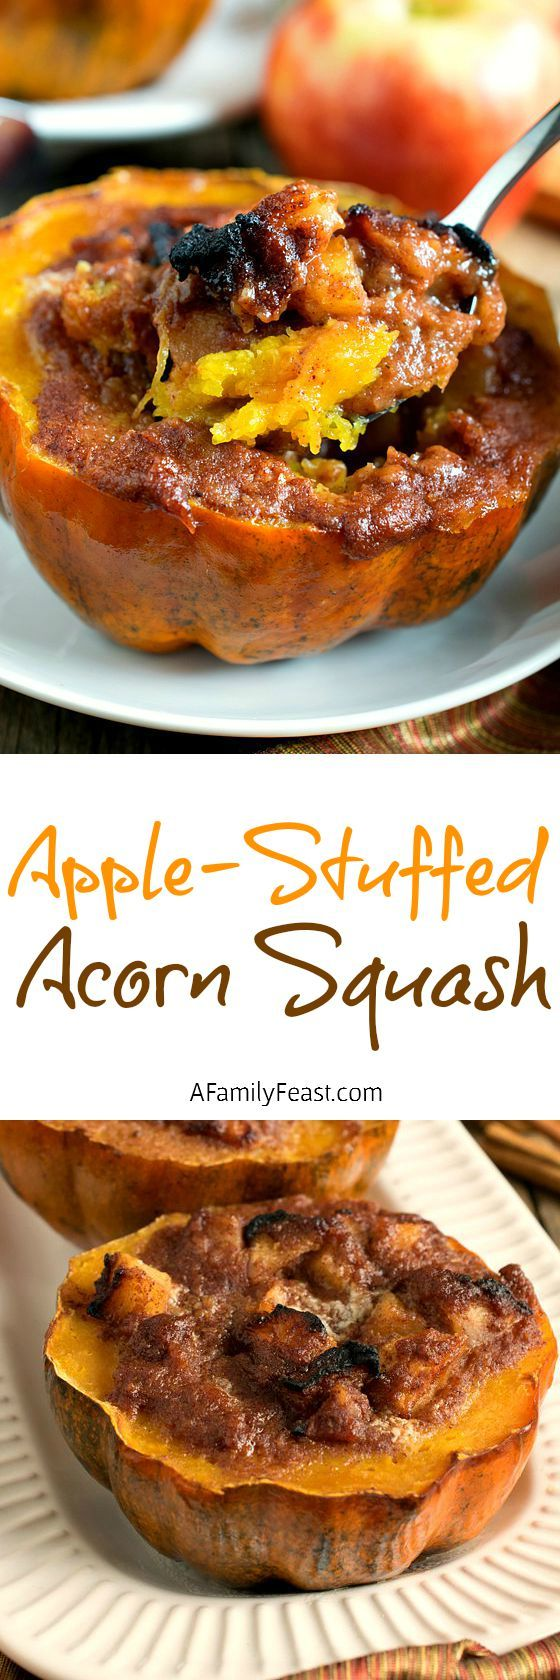 Apple Stuffed Acorn Squash Recipe Food Food Recipes Vegan